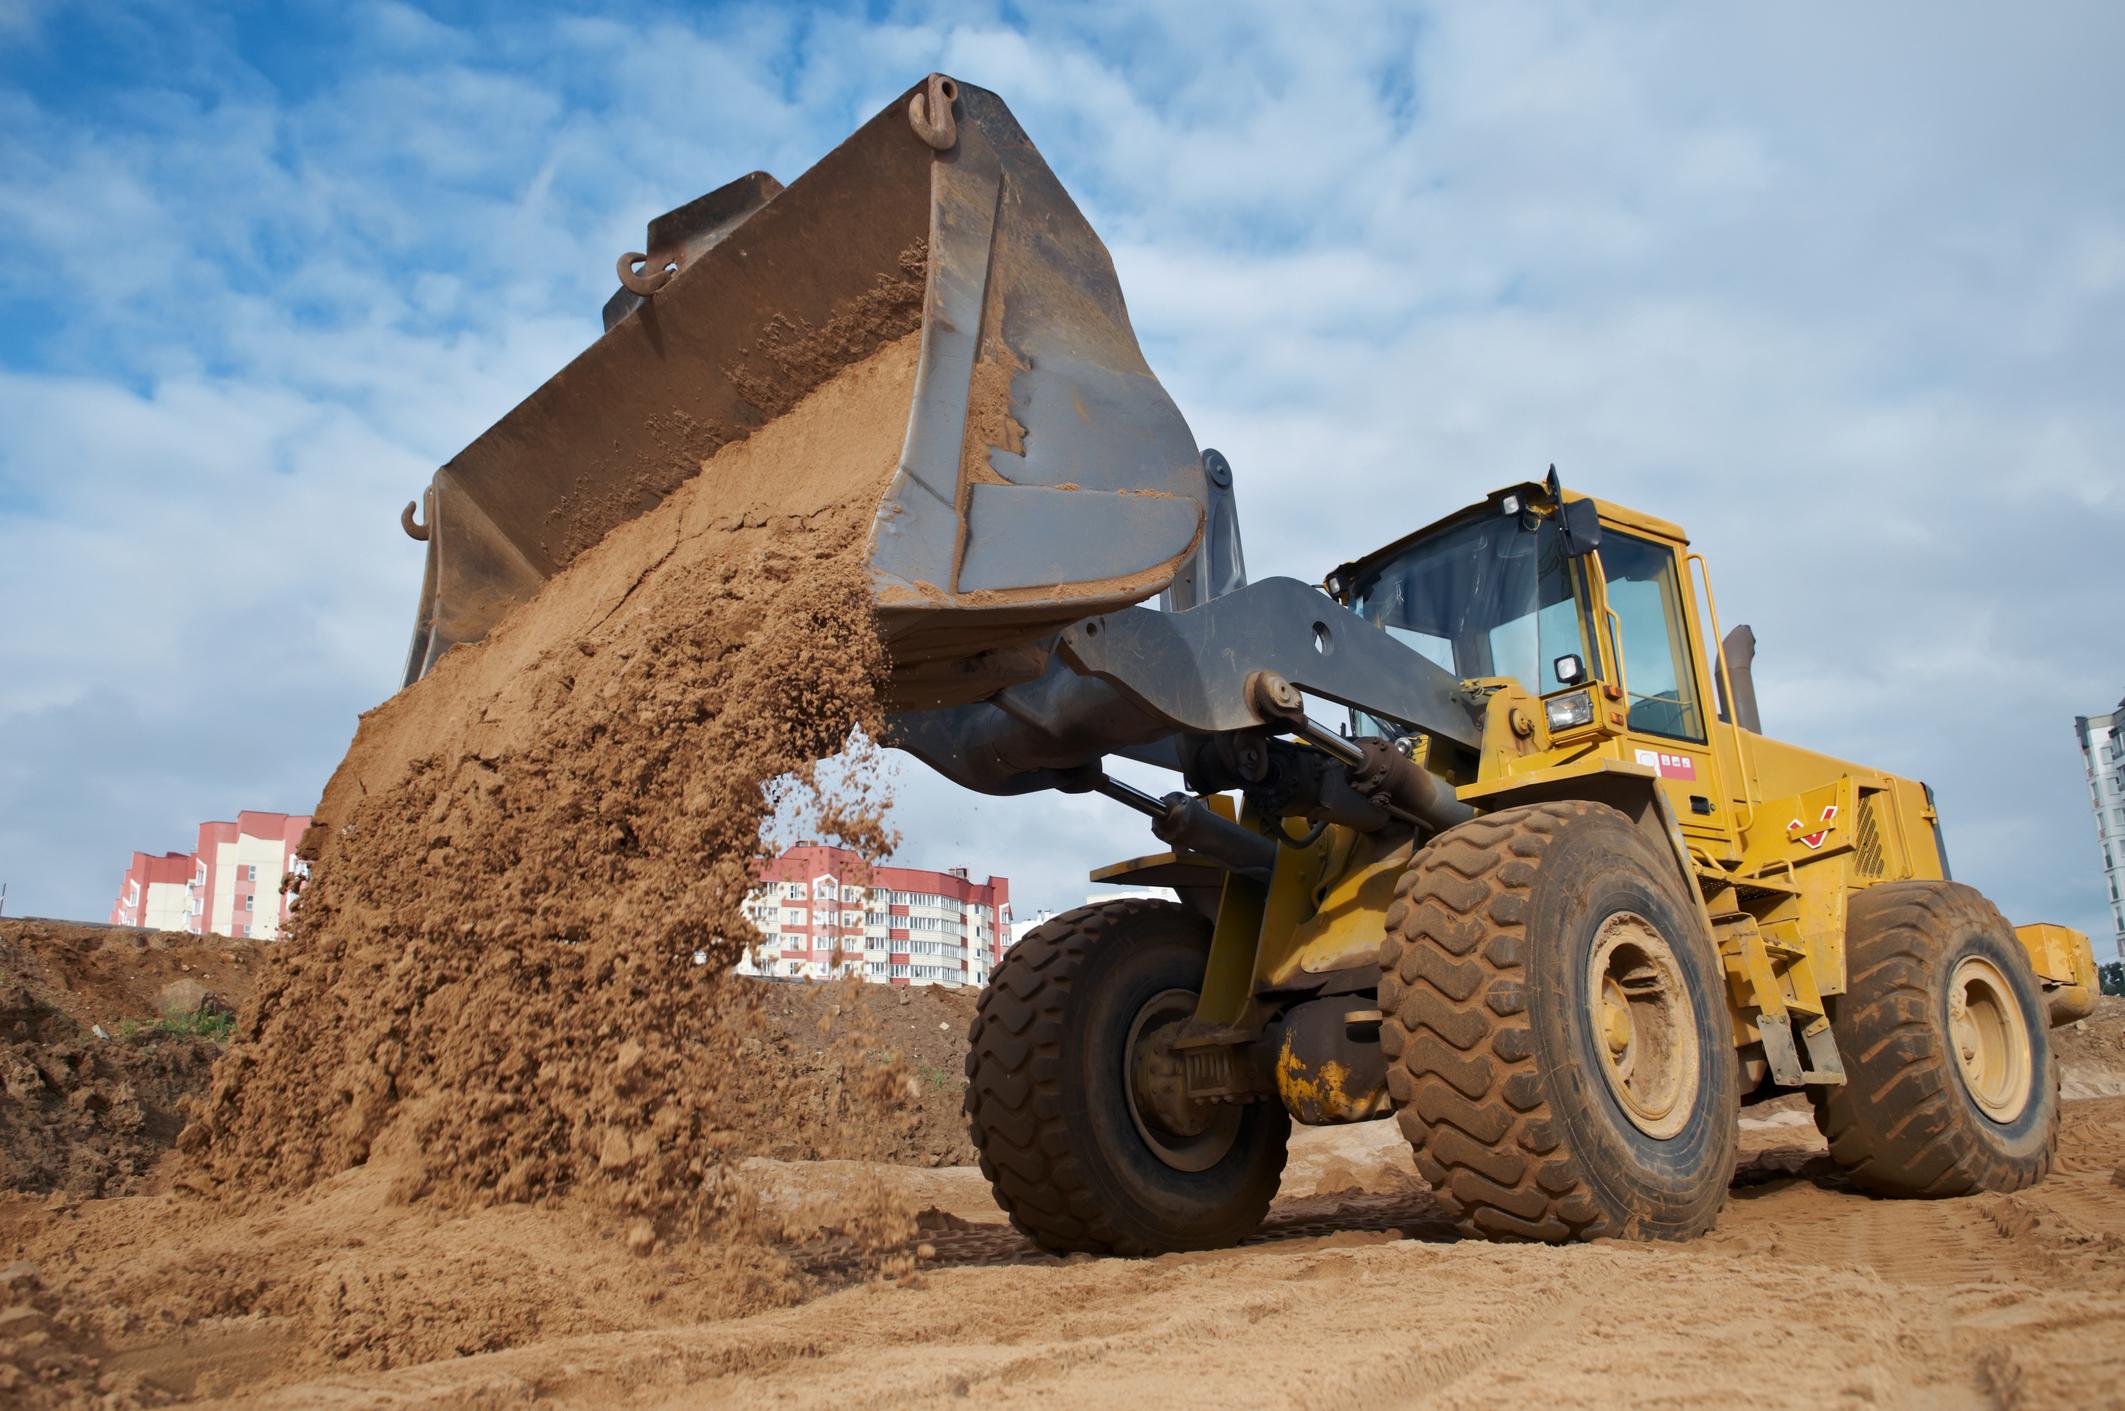 Excavator dumping sand.